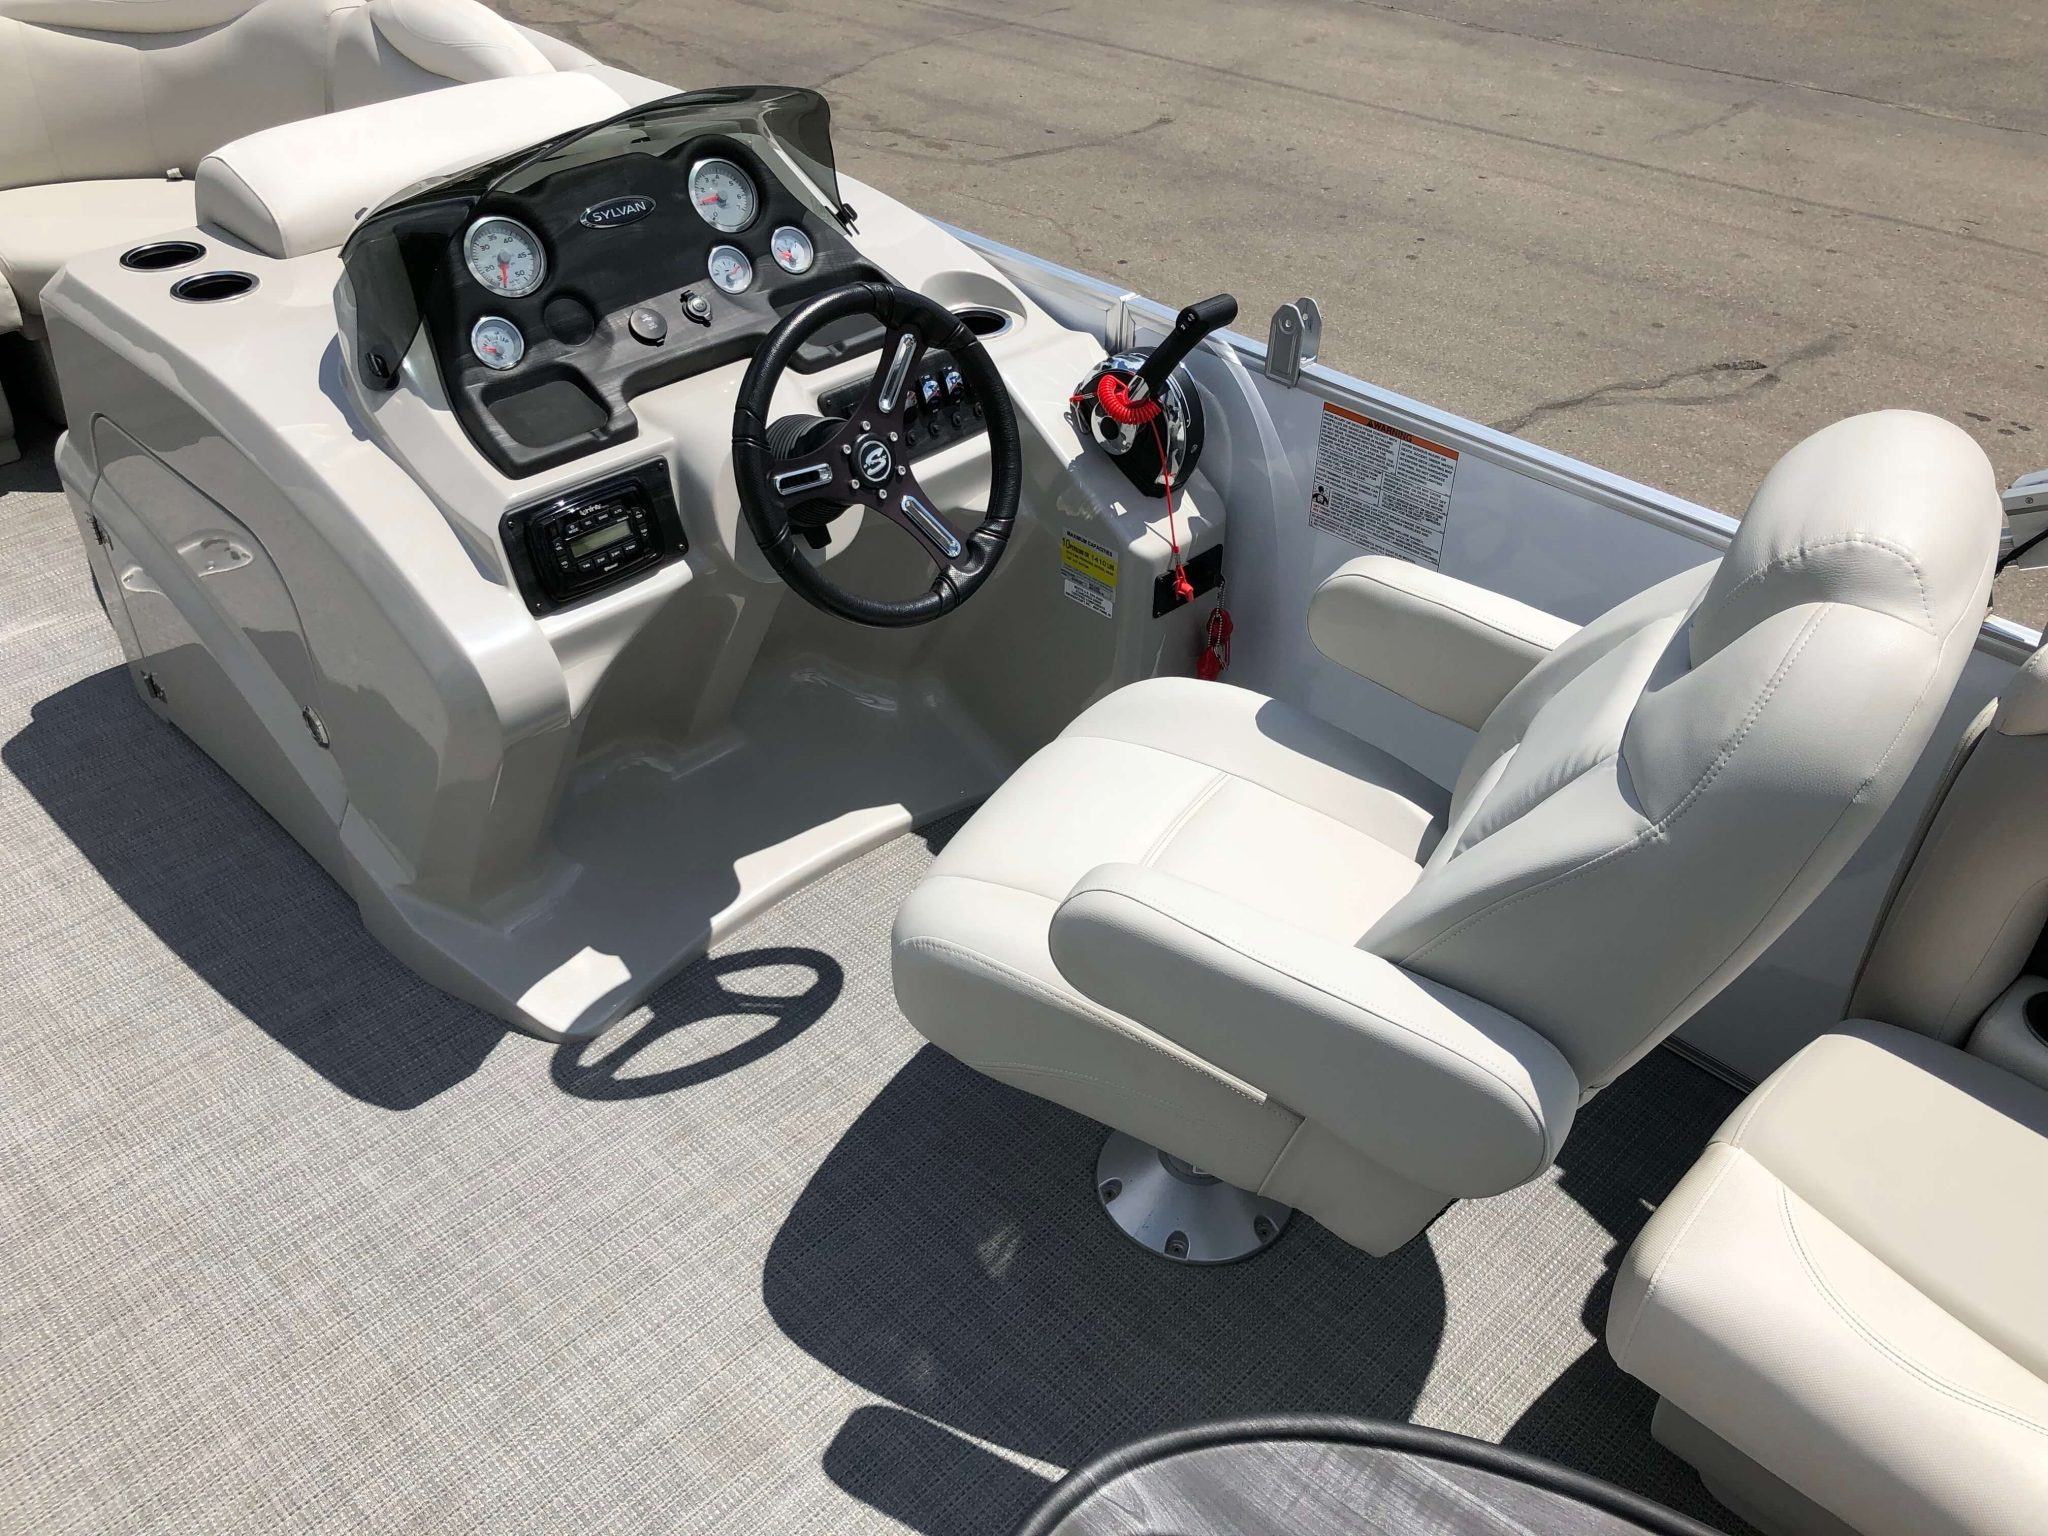 2016 Sylvan 8520 LZ LES Pontoon Boat Helm